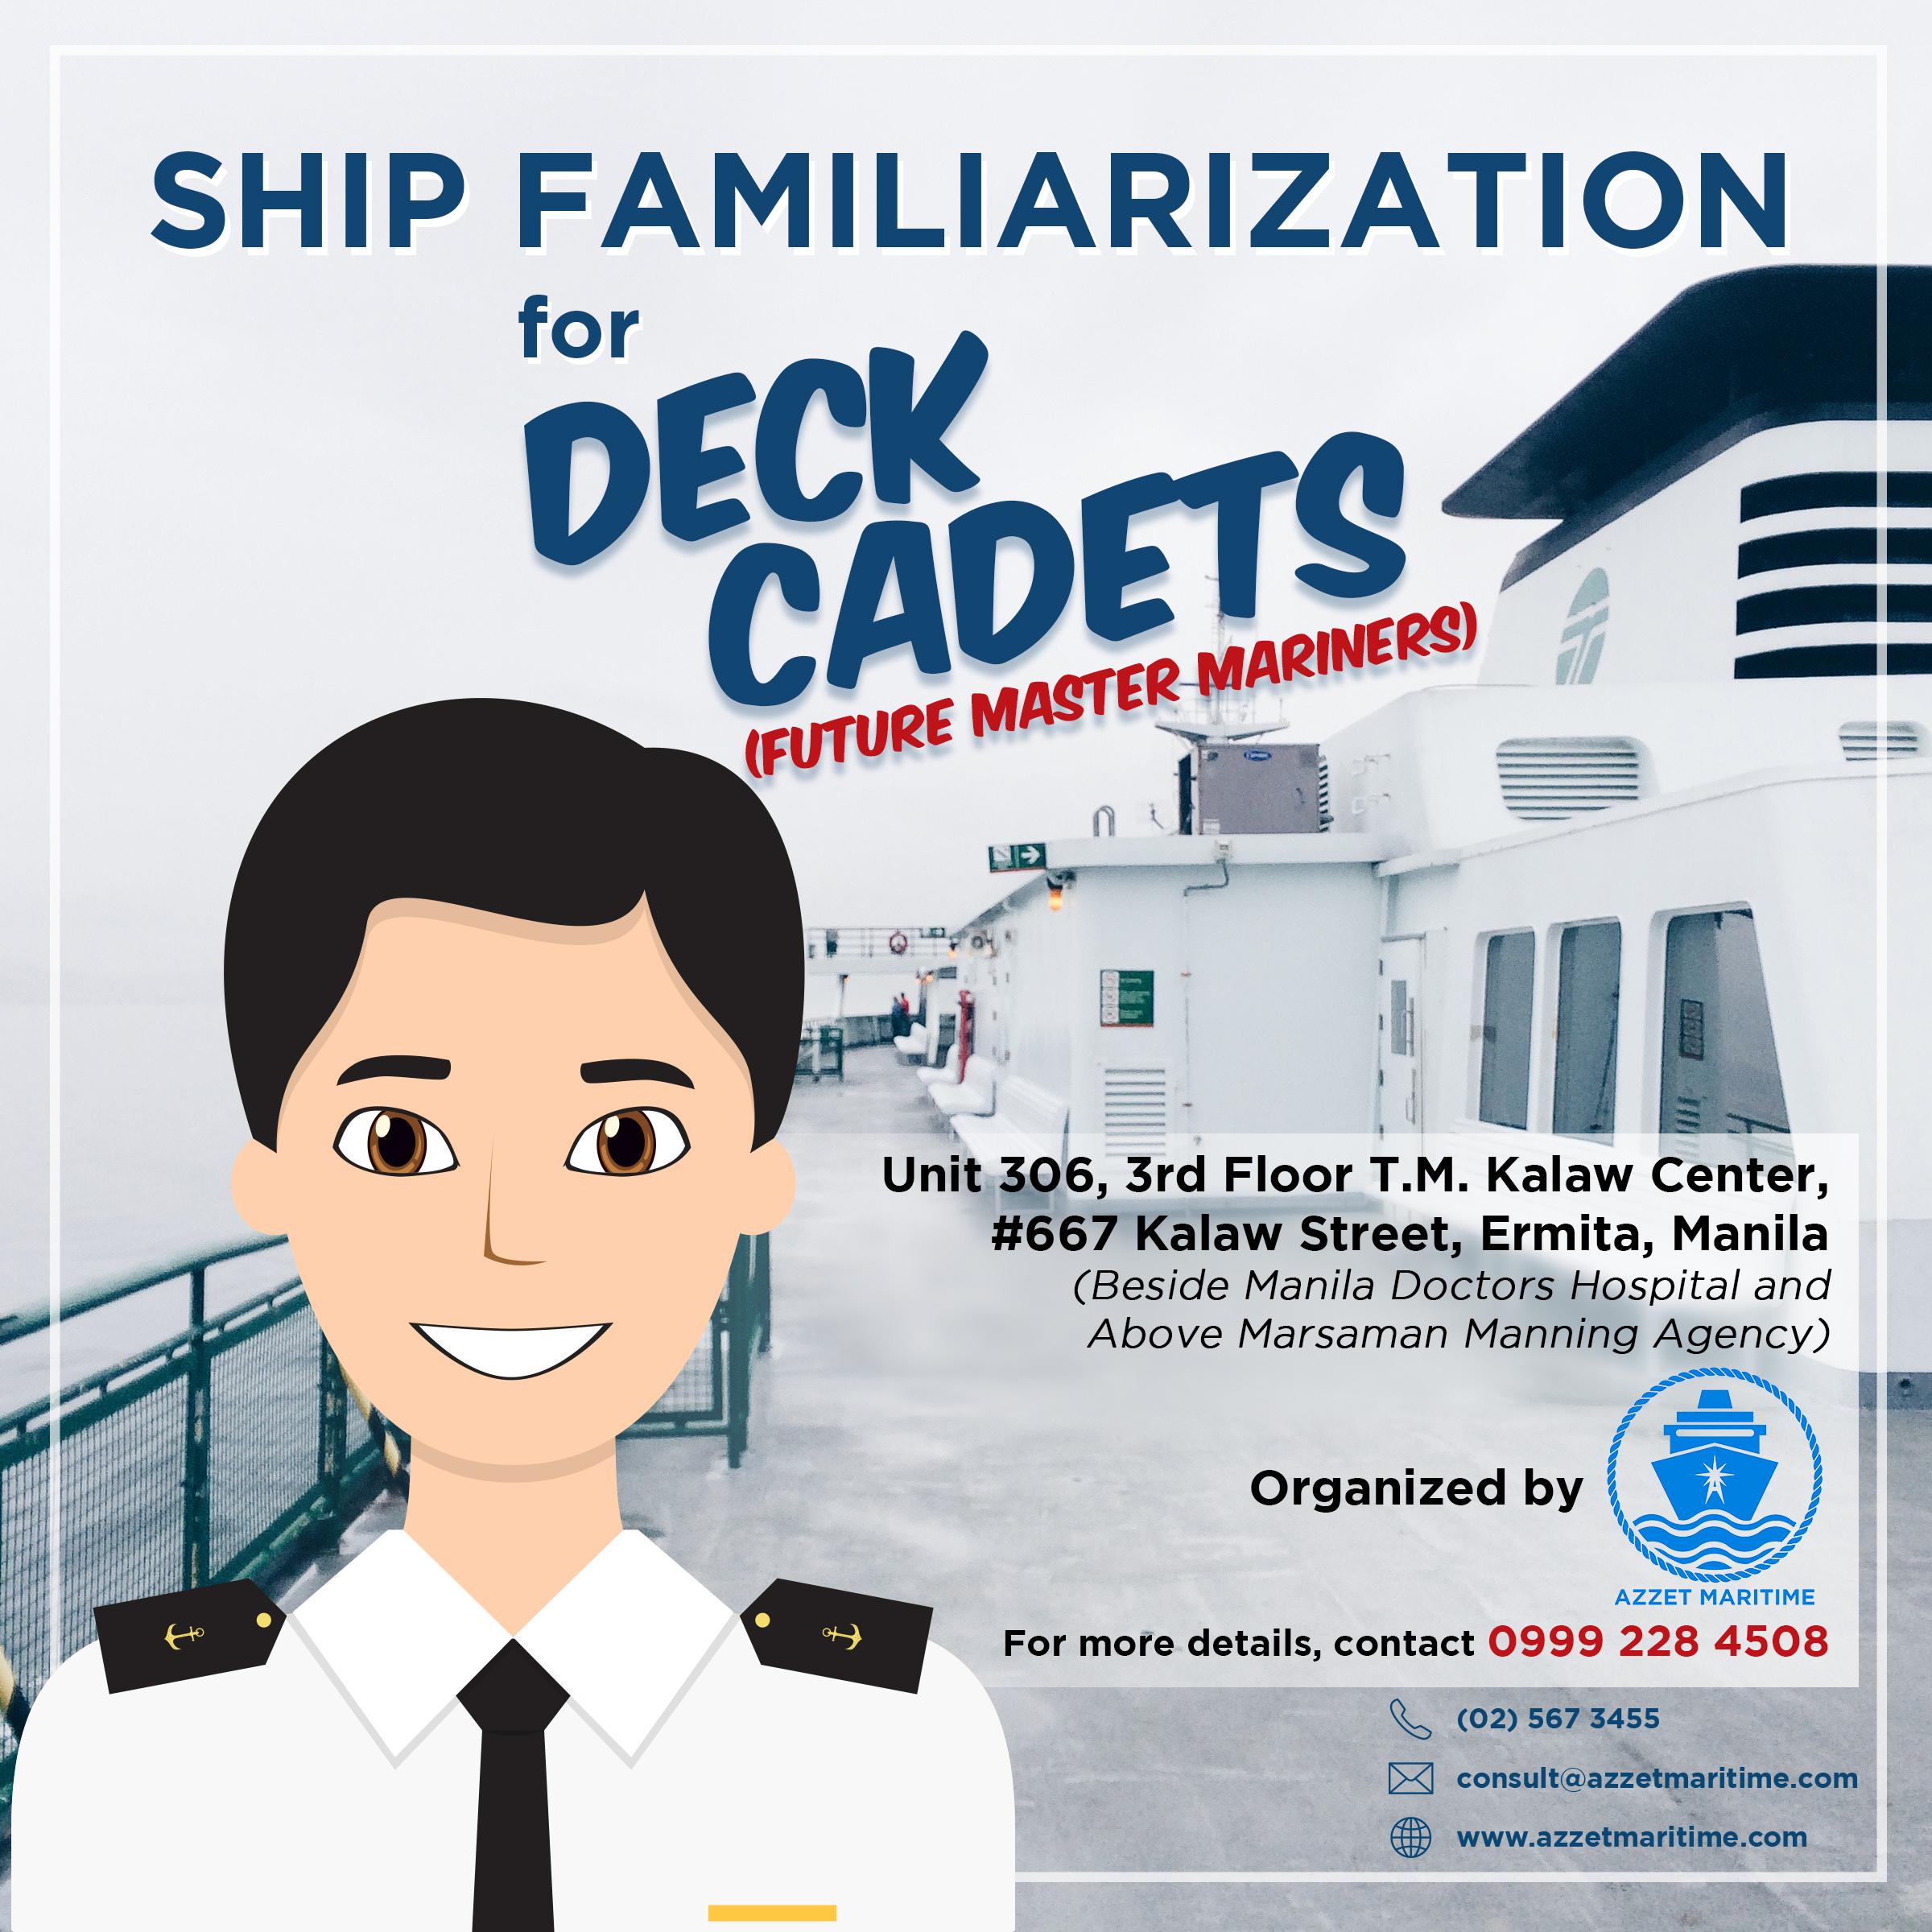 Ship Familiarization for Deck Cadets